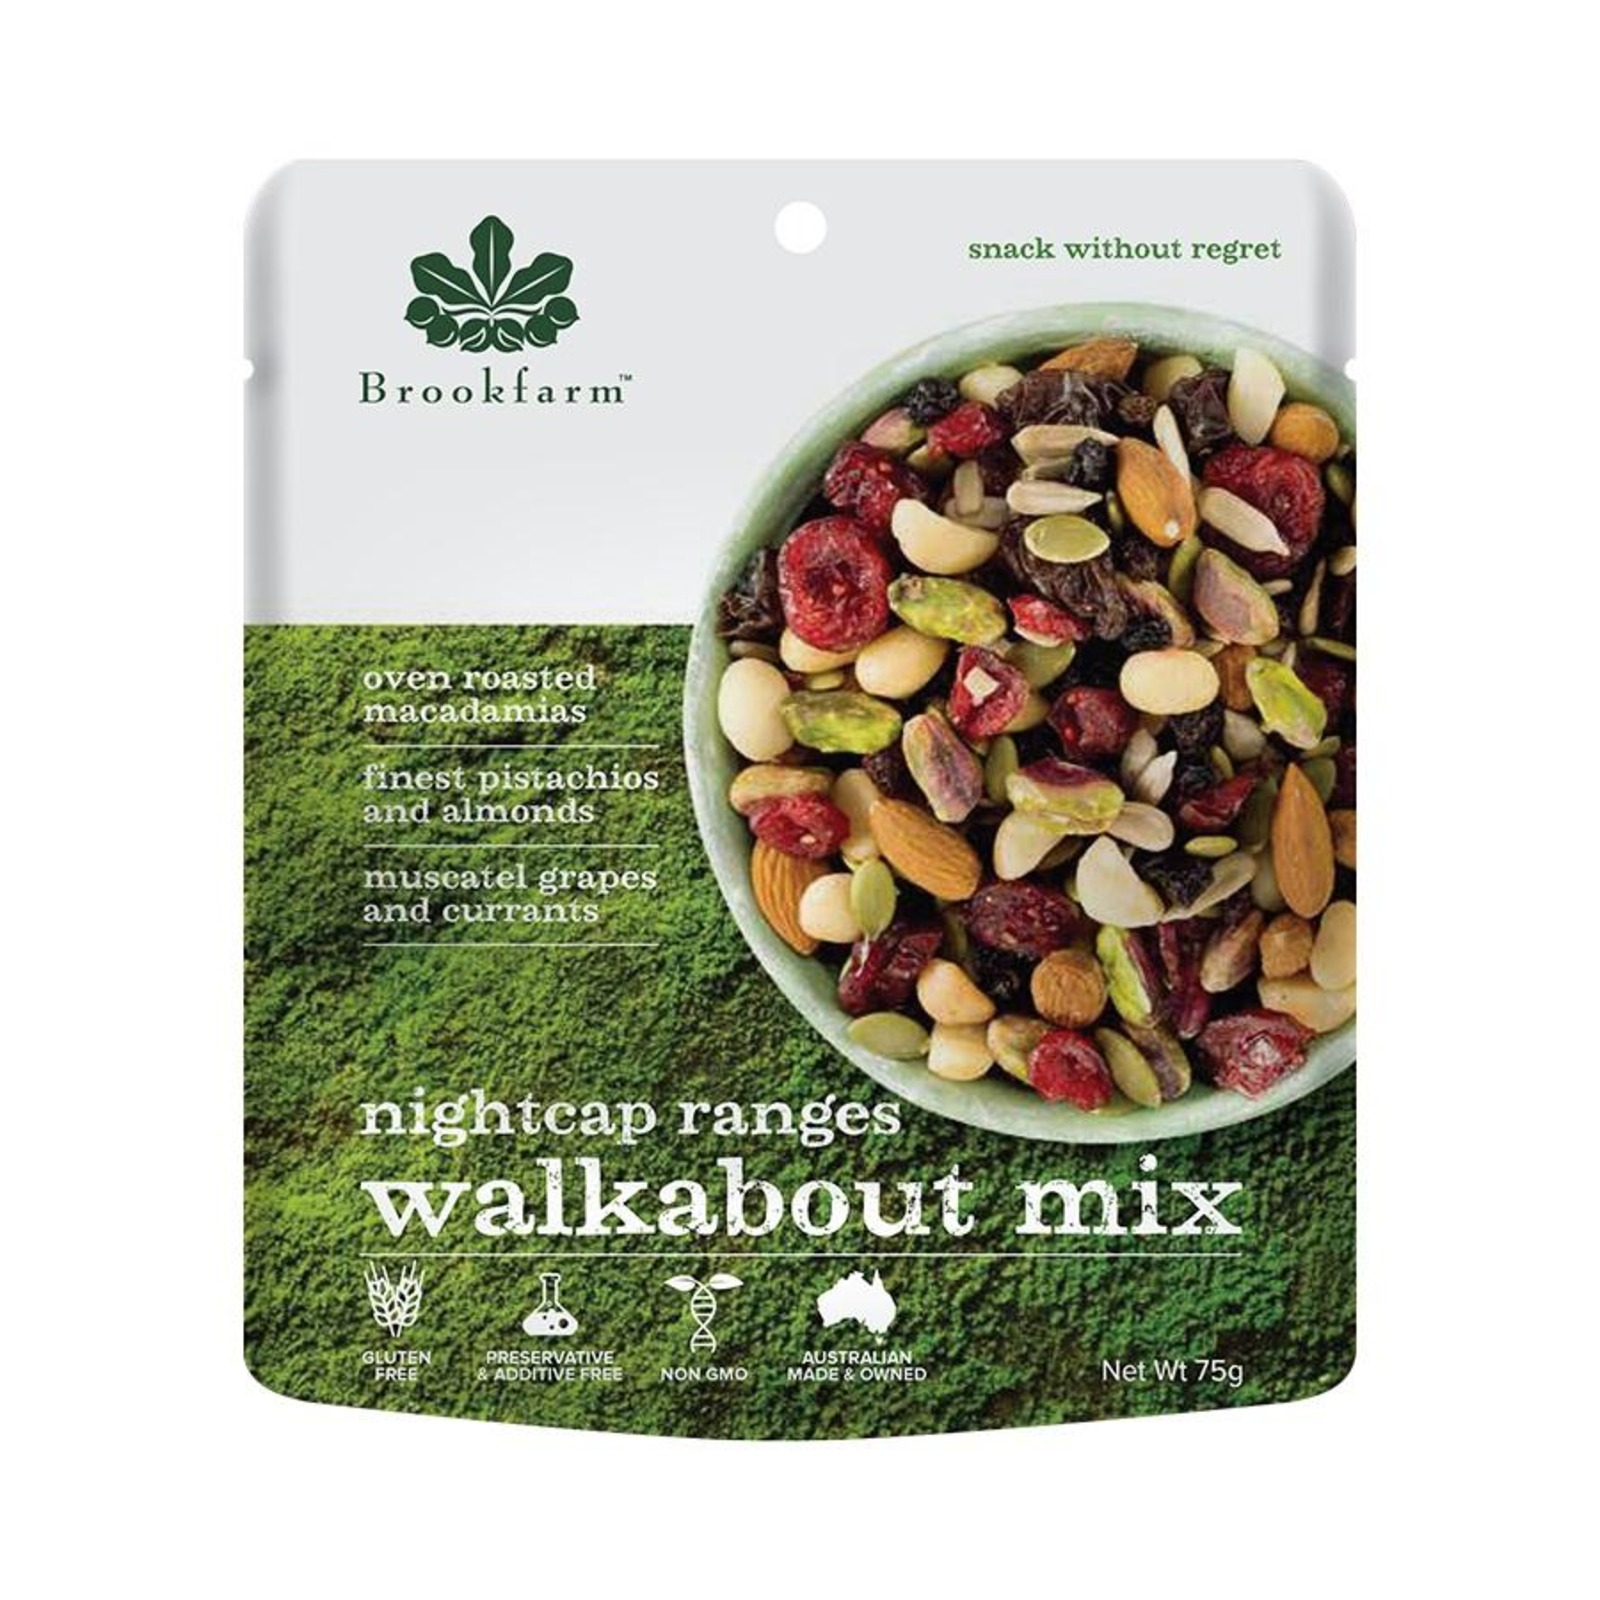 Brookfarm Nightcap Ranges Walkabout Mix